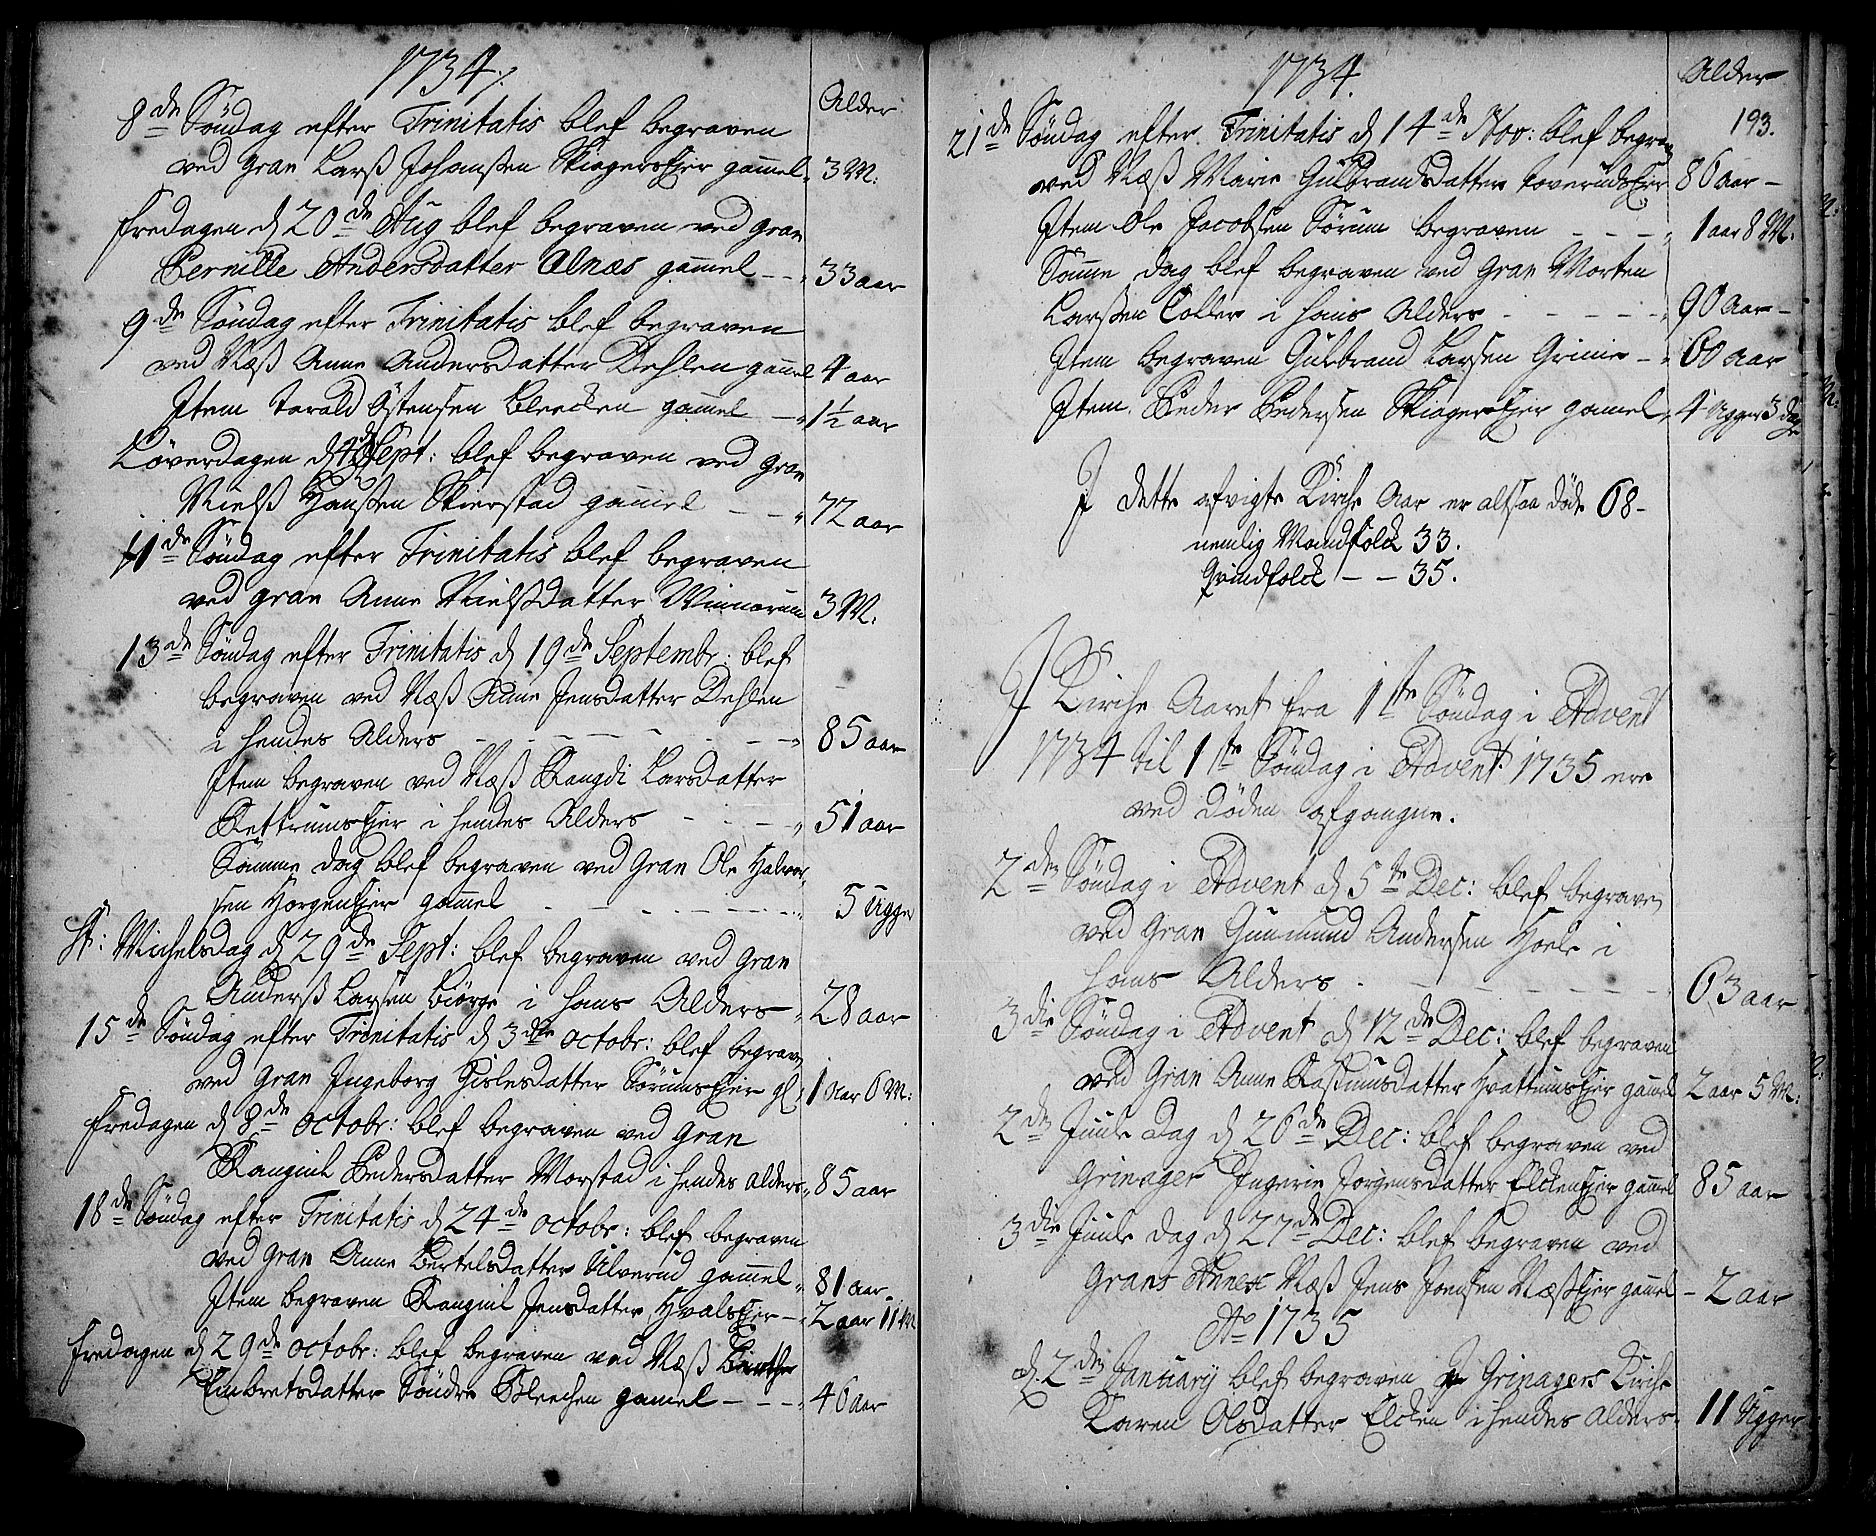 SAH, Gran prestekontor, Ministerialbok nr. 2, 1732-1744, s. 193